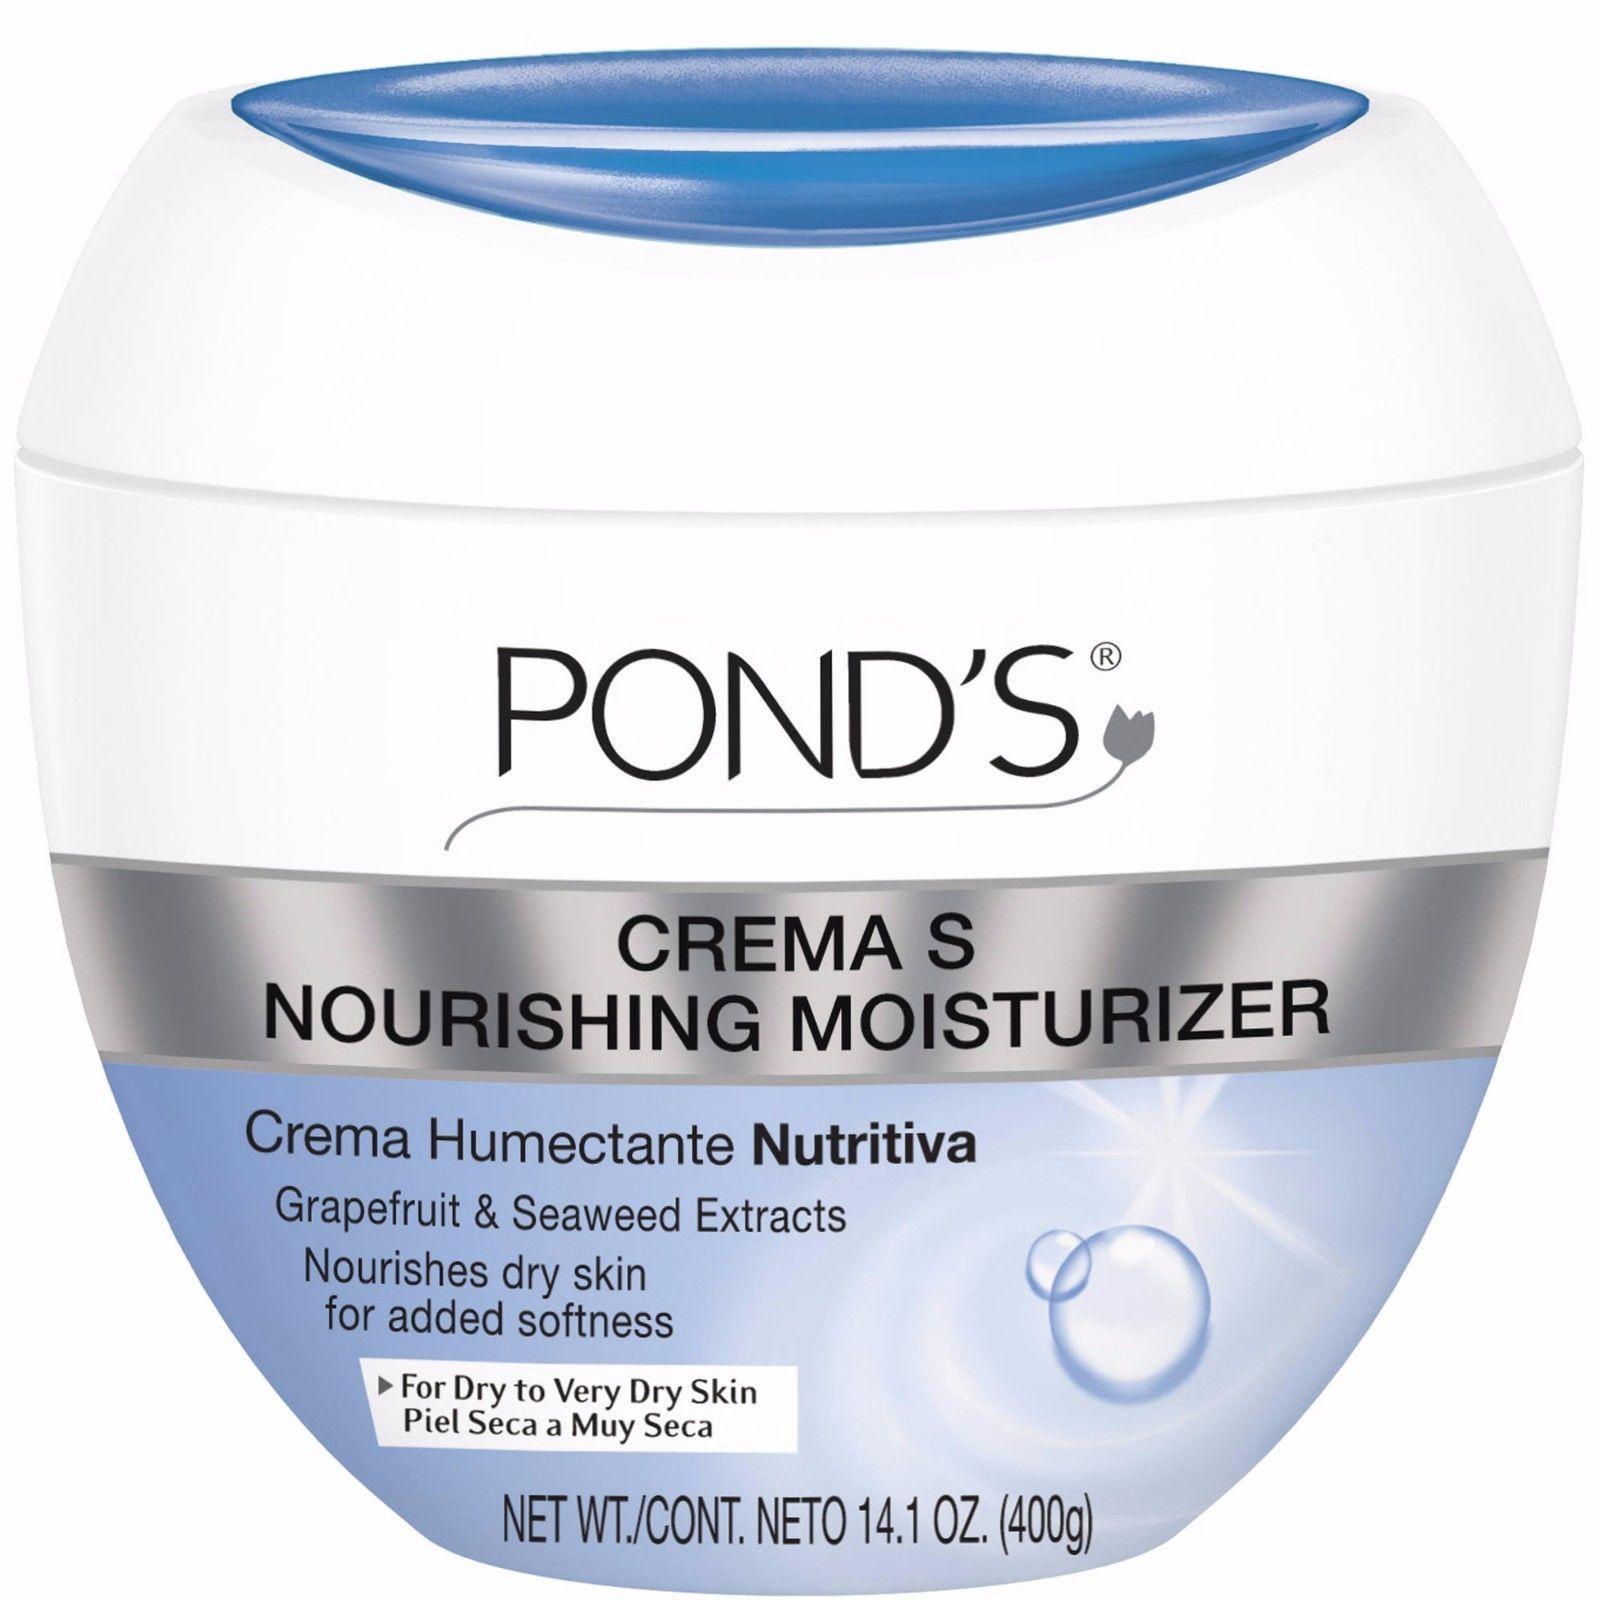 Pond 39 s crema s nourishing moisturizing cream 14 1 oz for Ponds products